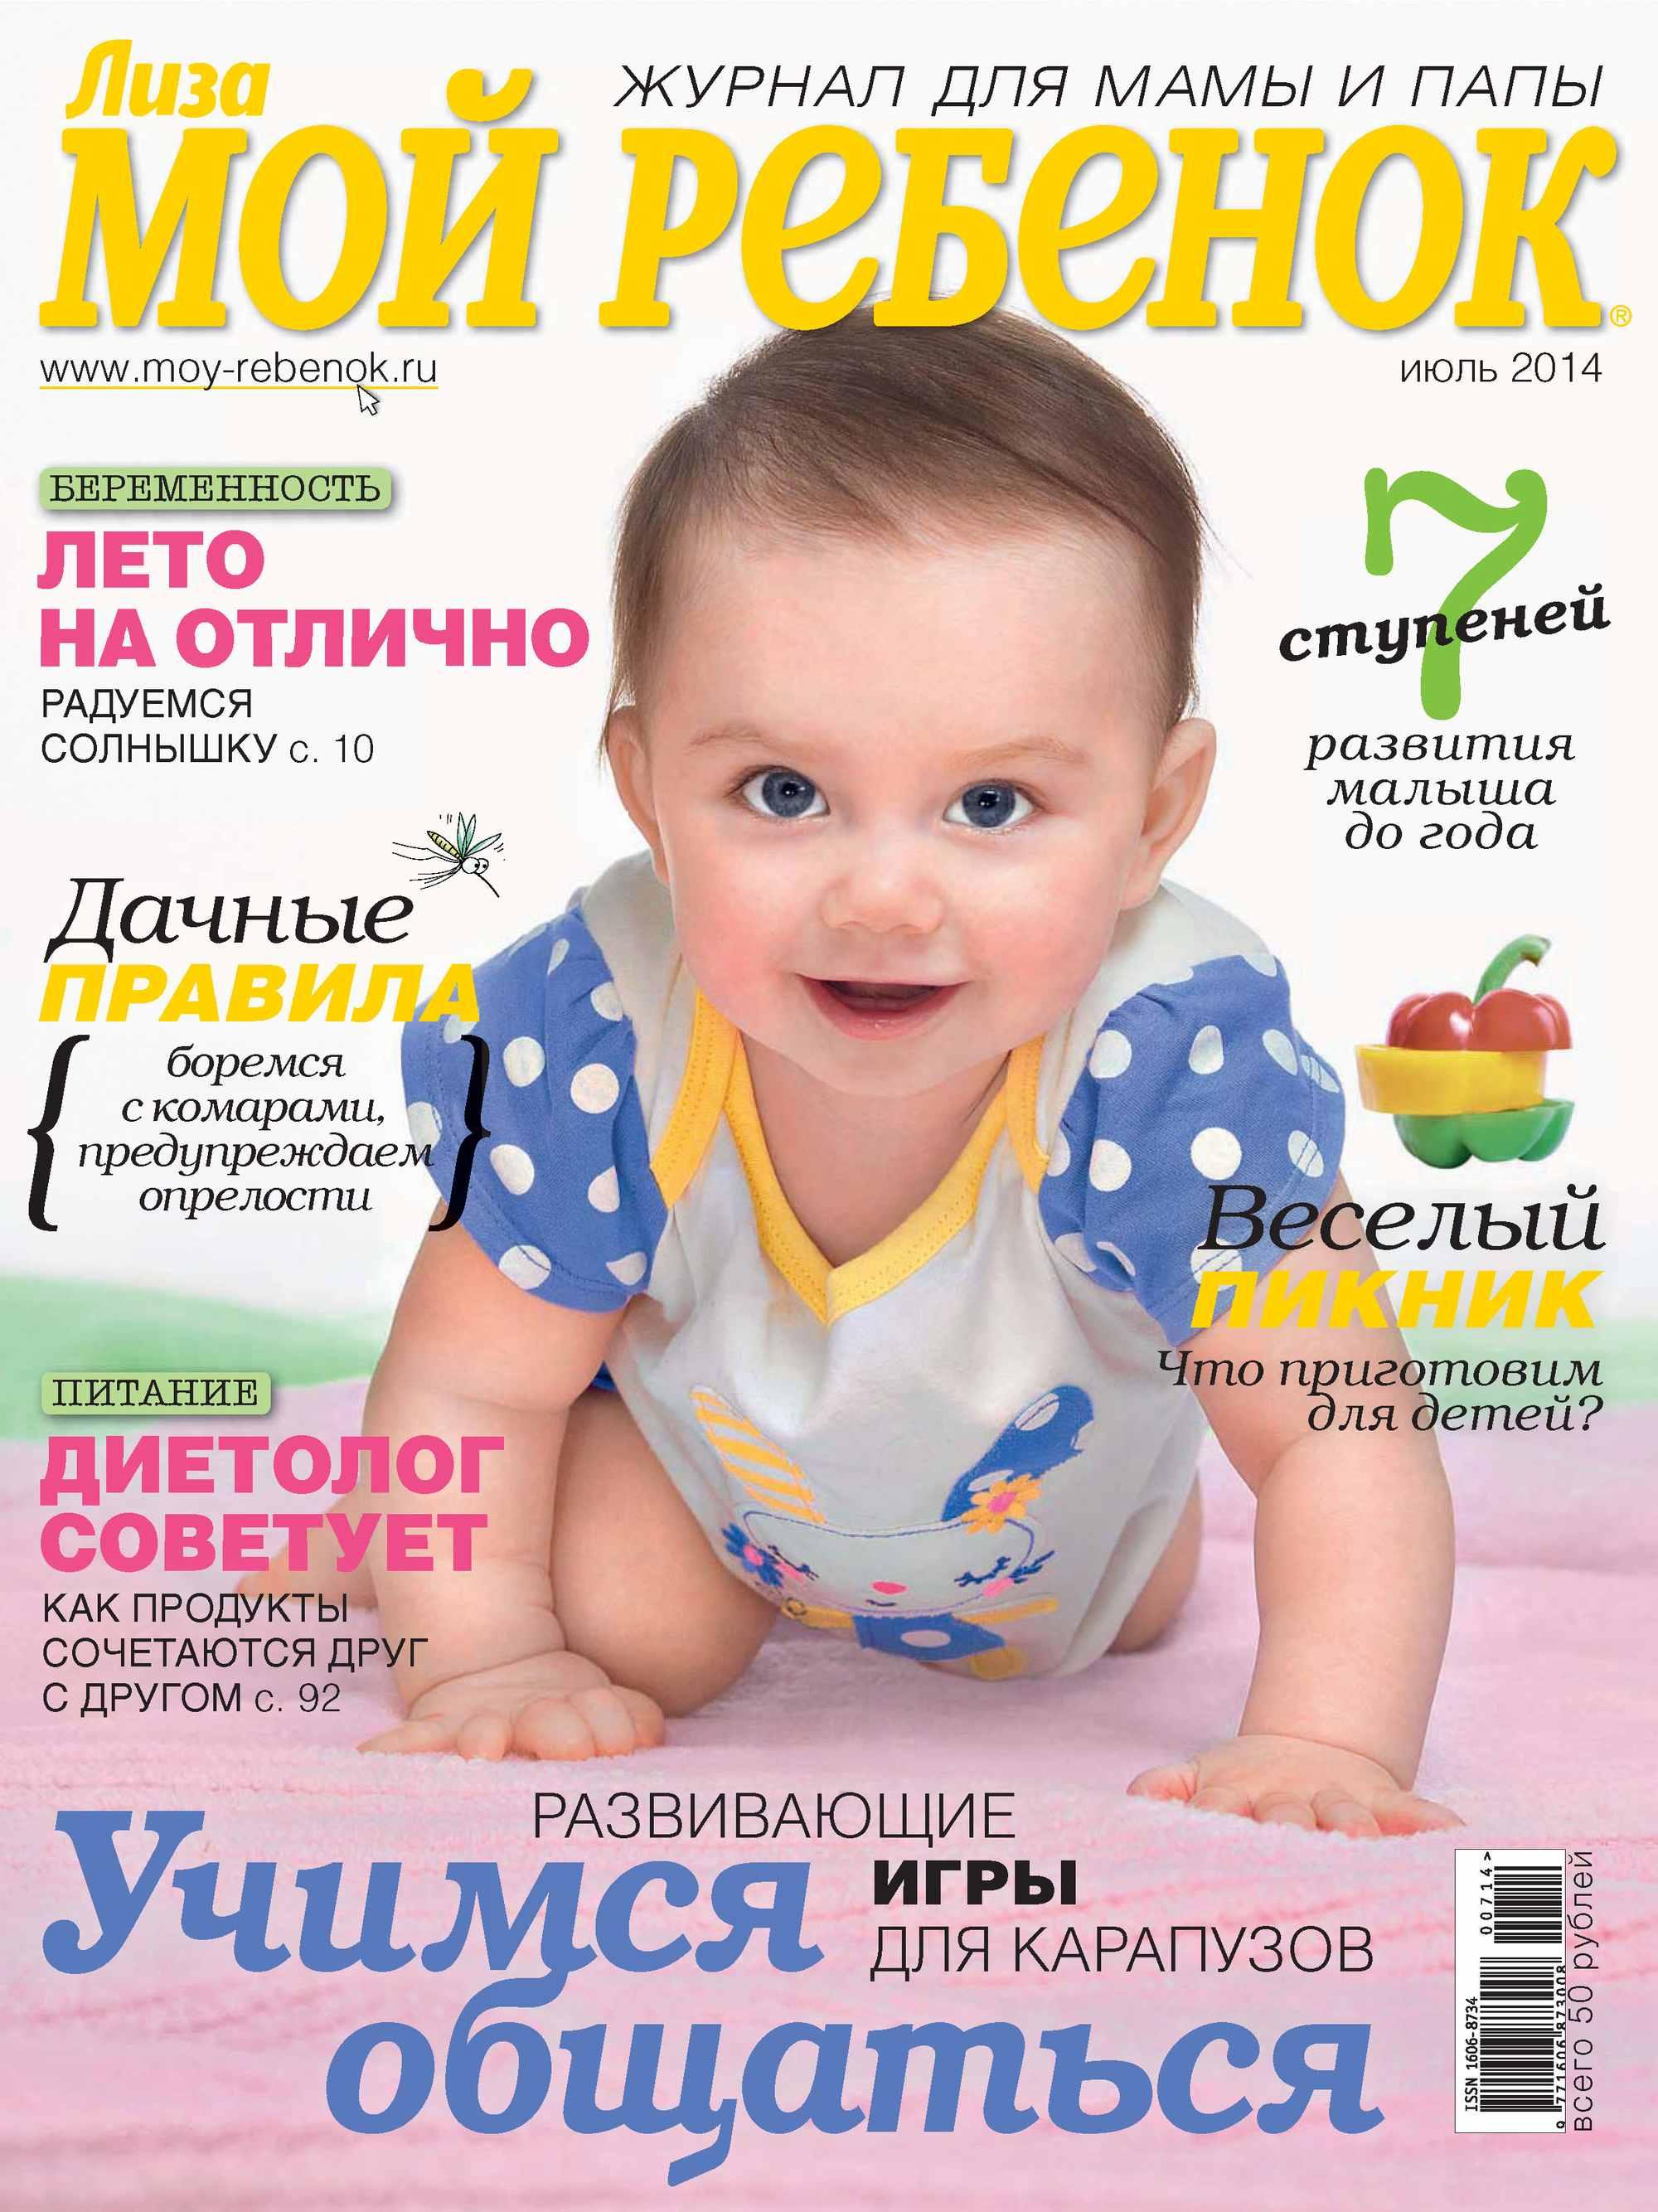 ИД «Бурда» Журнал «Лиза. Мой ребенок» №07/2014 ид бурда журнал лиза мой ребенок 03 2014